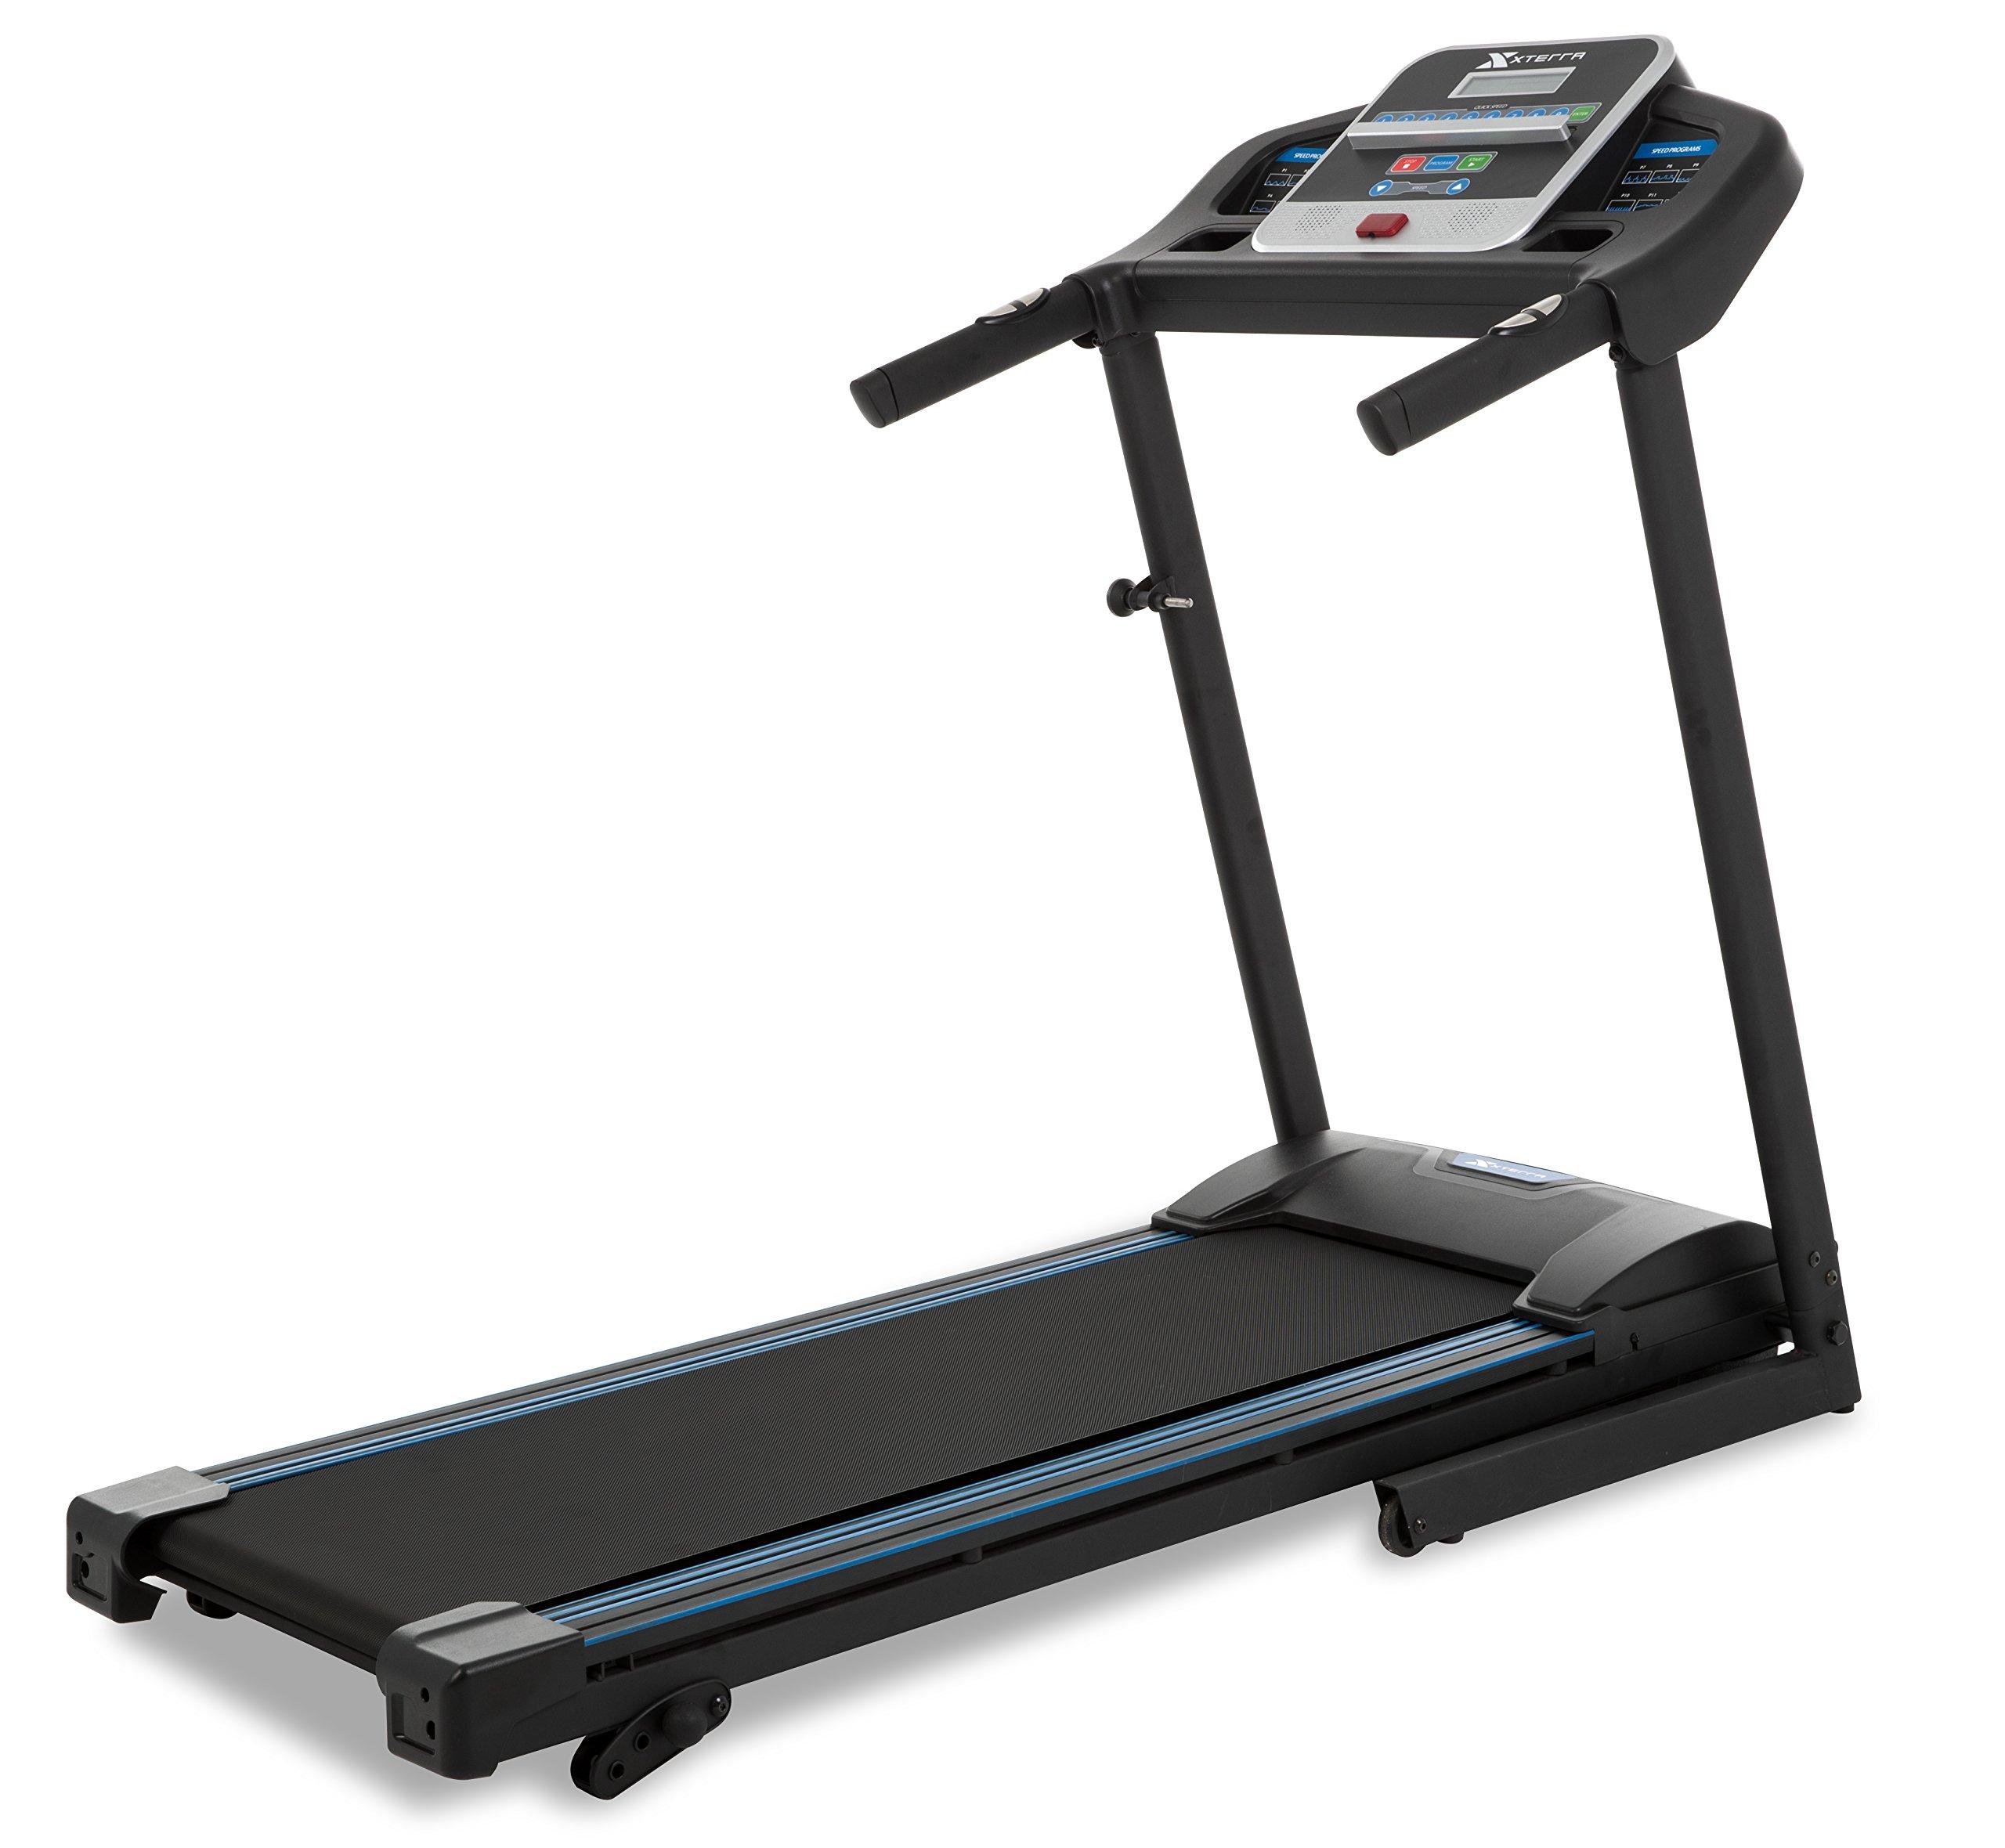 XTERRA TR150 Folding Treadmill Black by Xterra Fitness